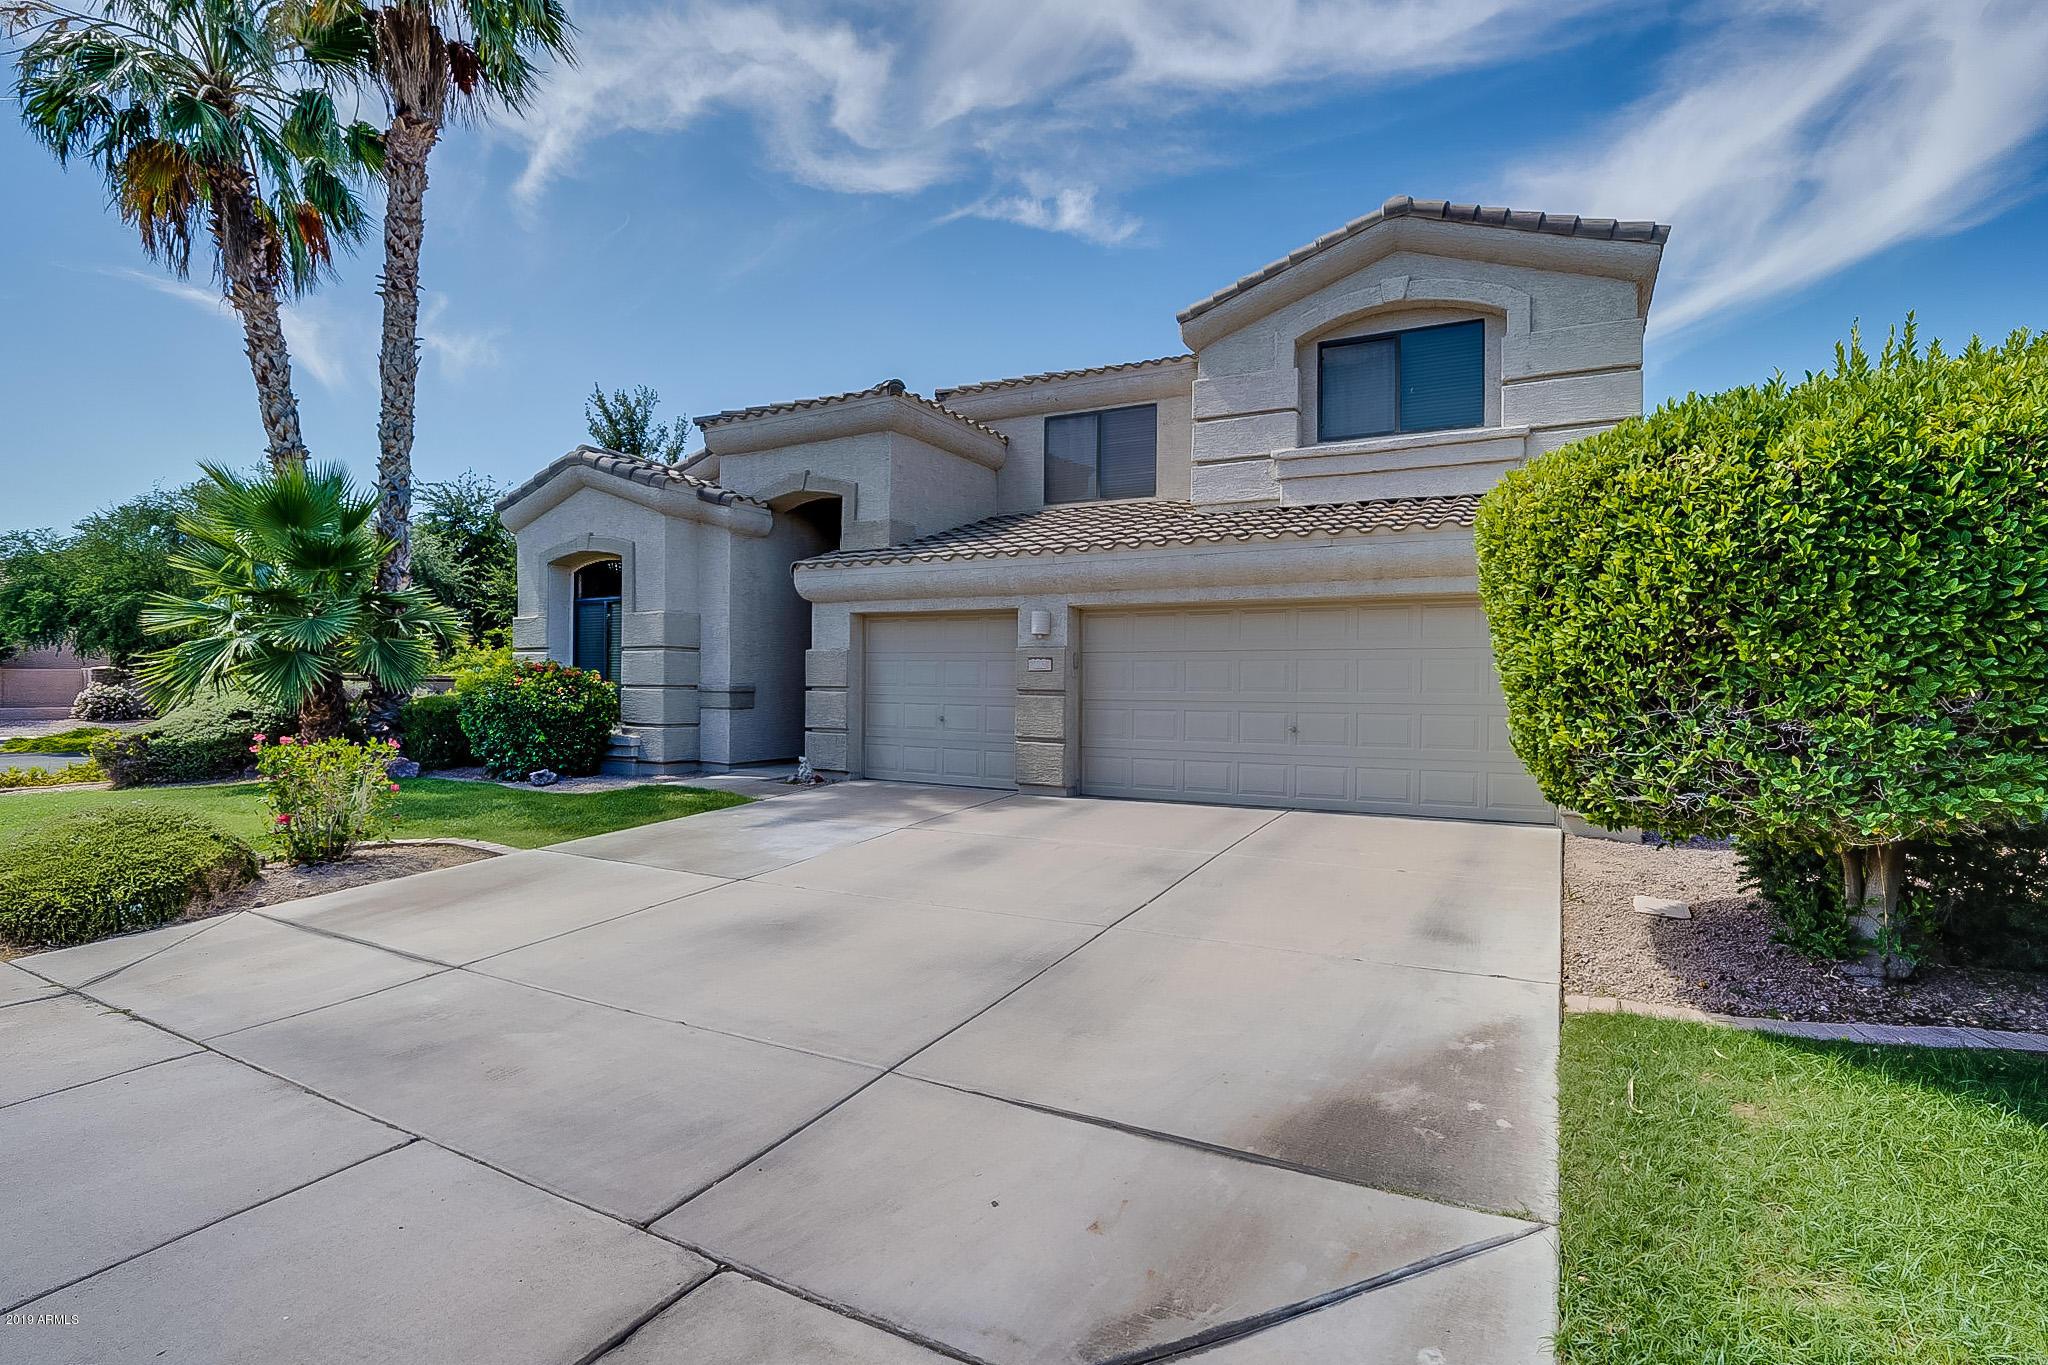 Photo of 692 W HONEYSUCKLE Drive, Chandler, AZ 85248